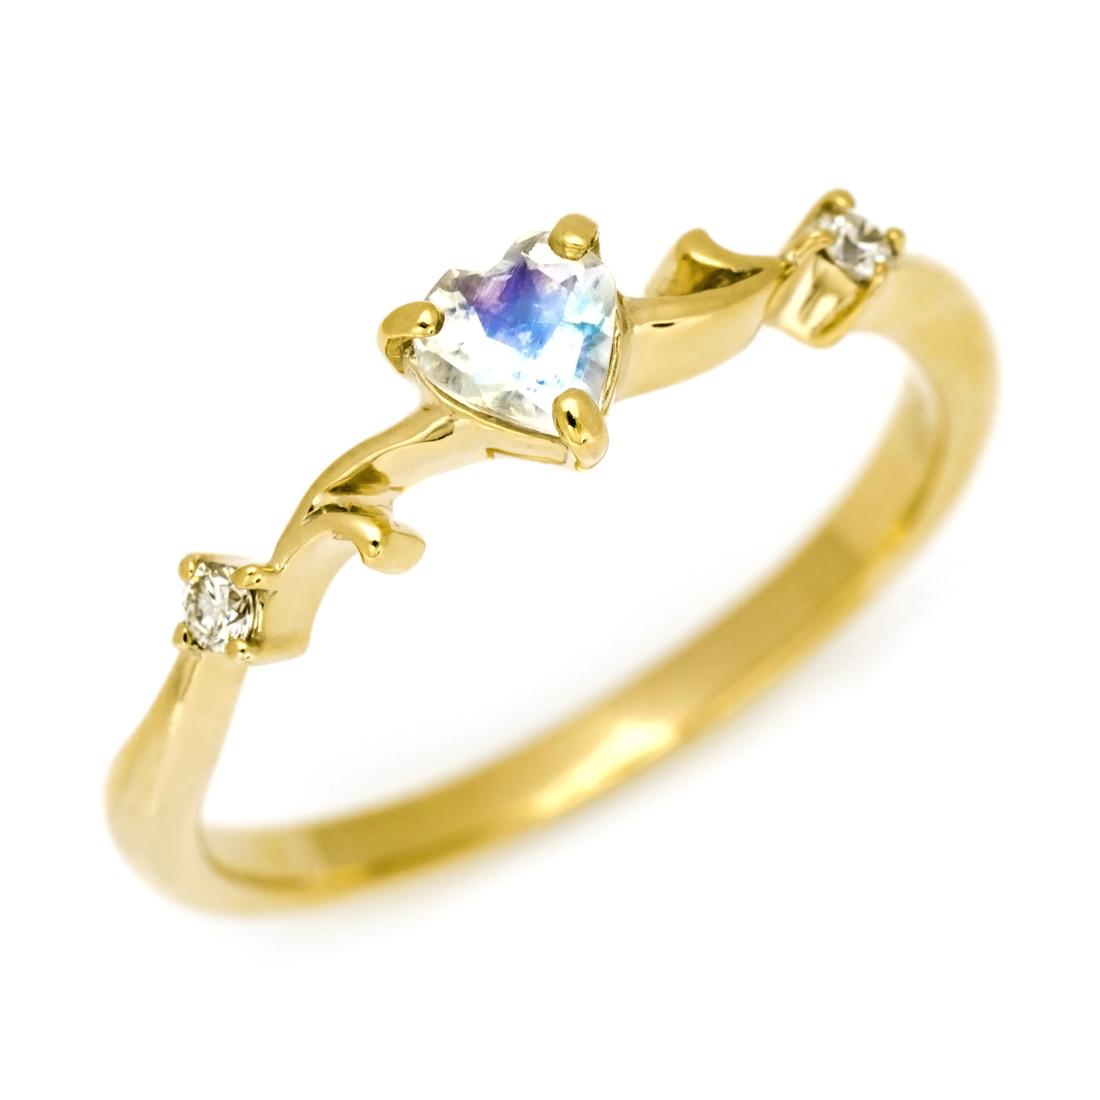 【GWクーポン配布中】リング ブルームーンストーン ダイヤモンド 「arzente」 ゴールド K10 送料無料